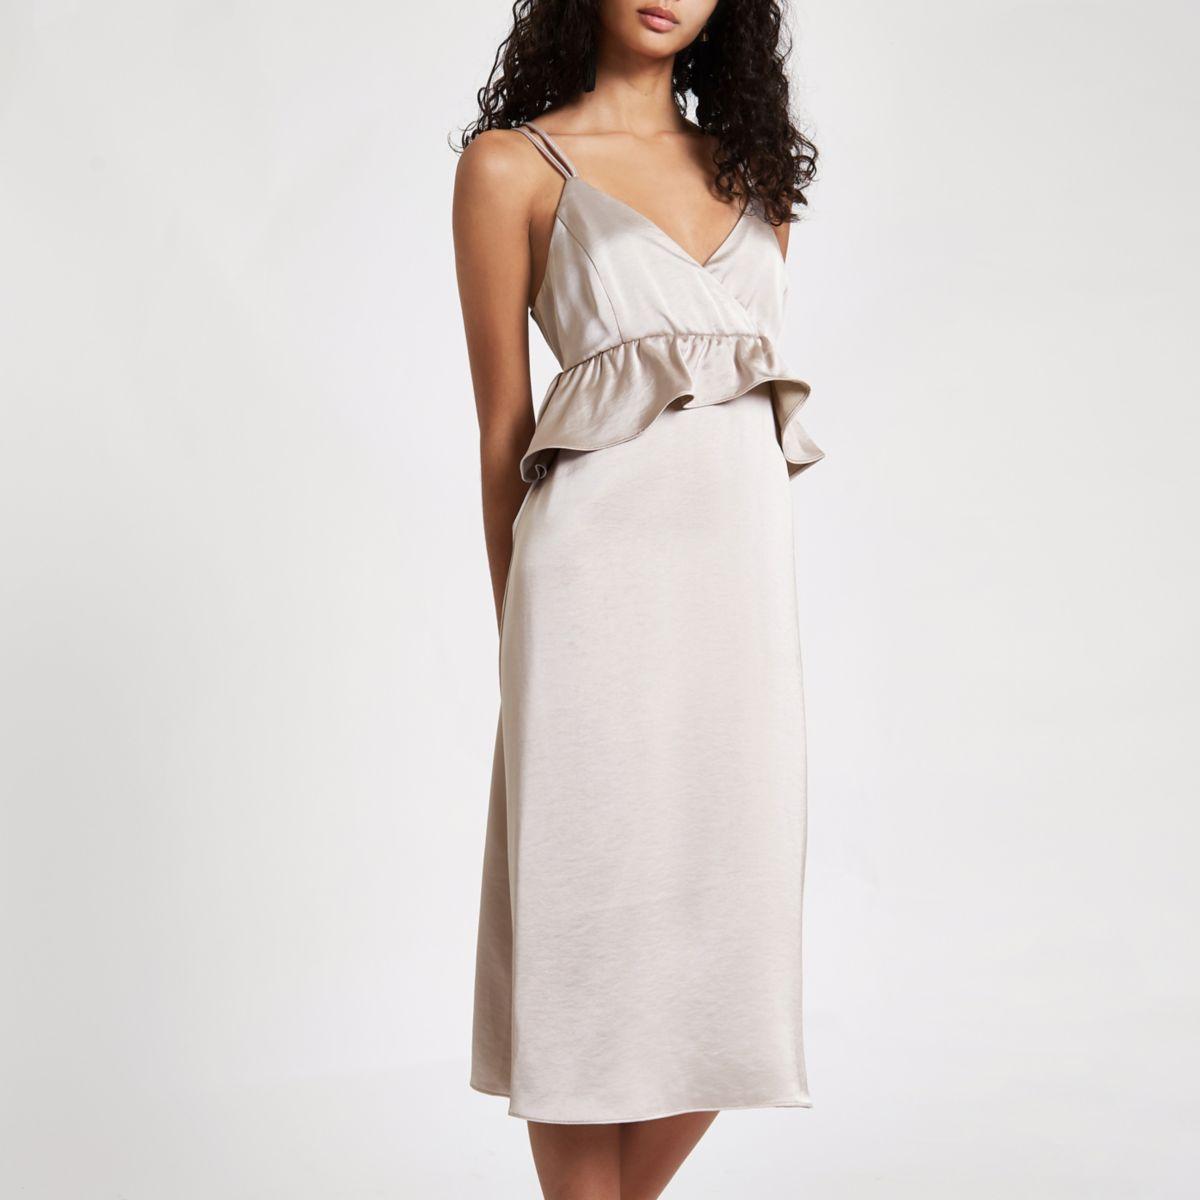 Silver satin frill strappy slip dress